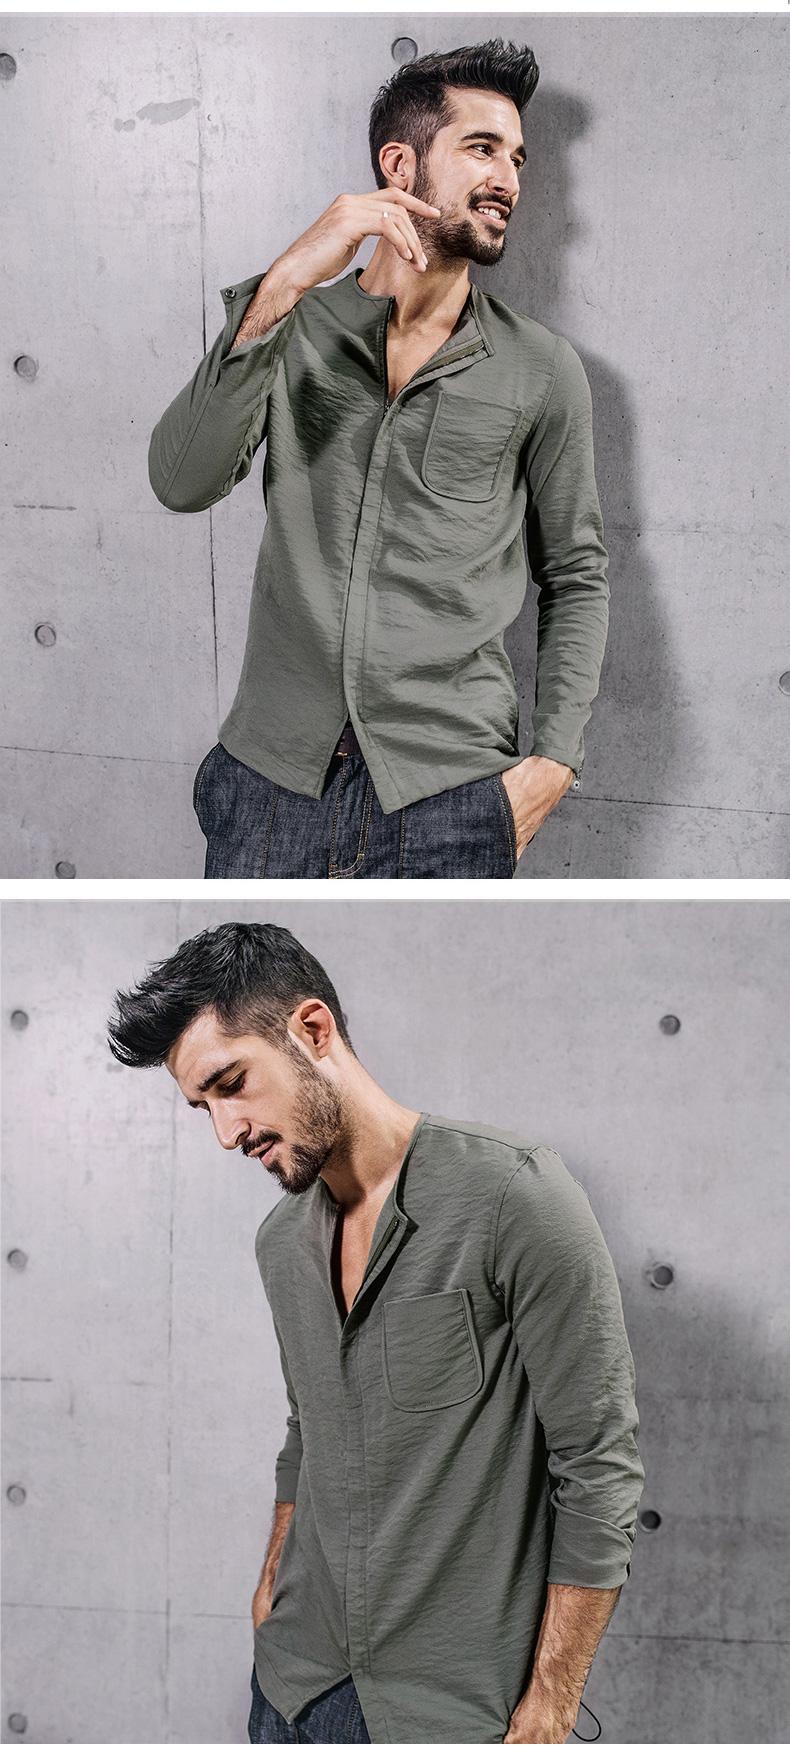 7b8f55b0c05c Kuegou Men s Casual Shirt - Gray Press Apparel